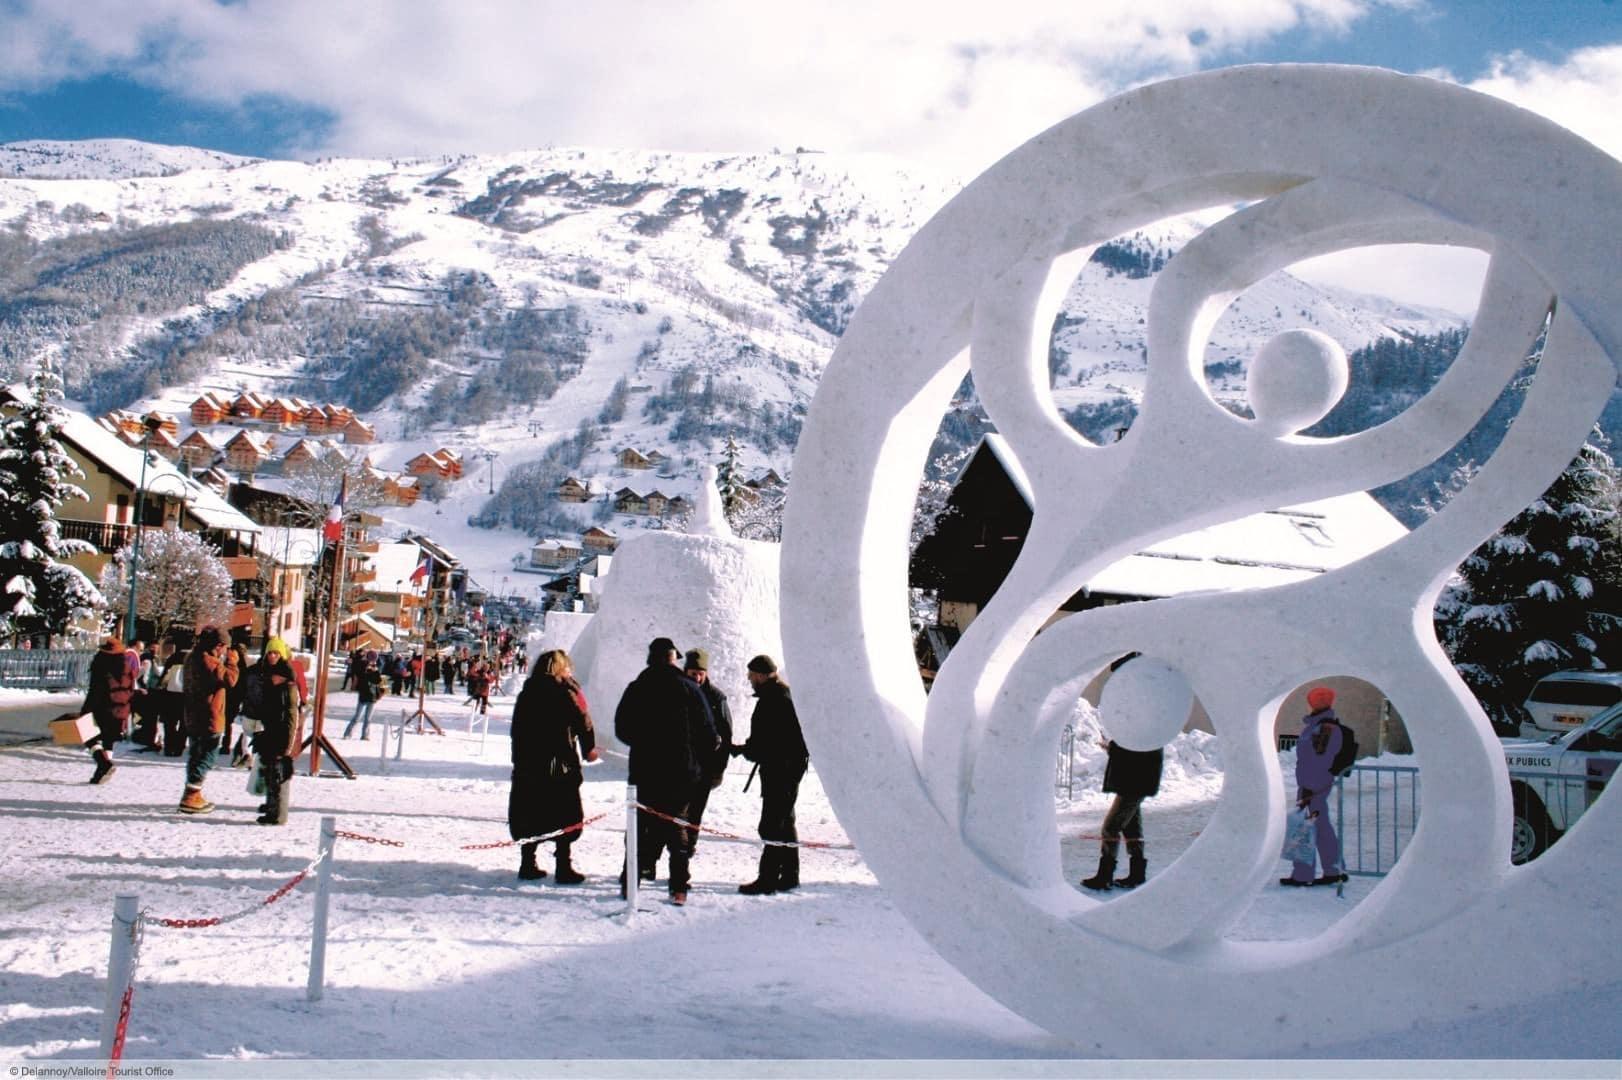 après-ski in Valloire